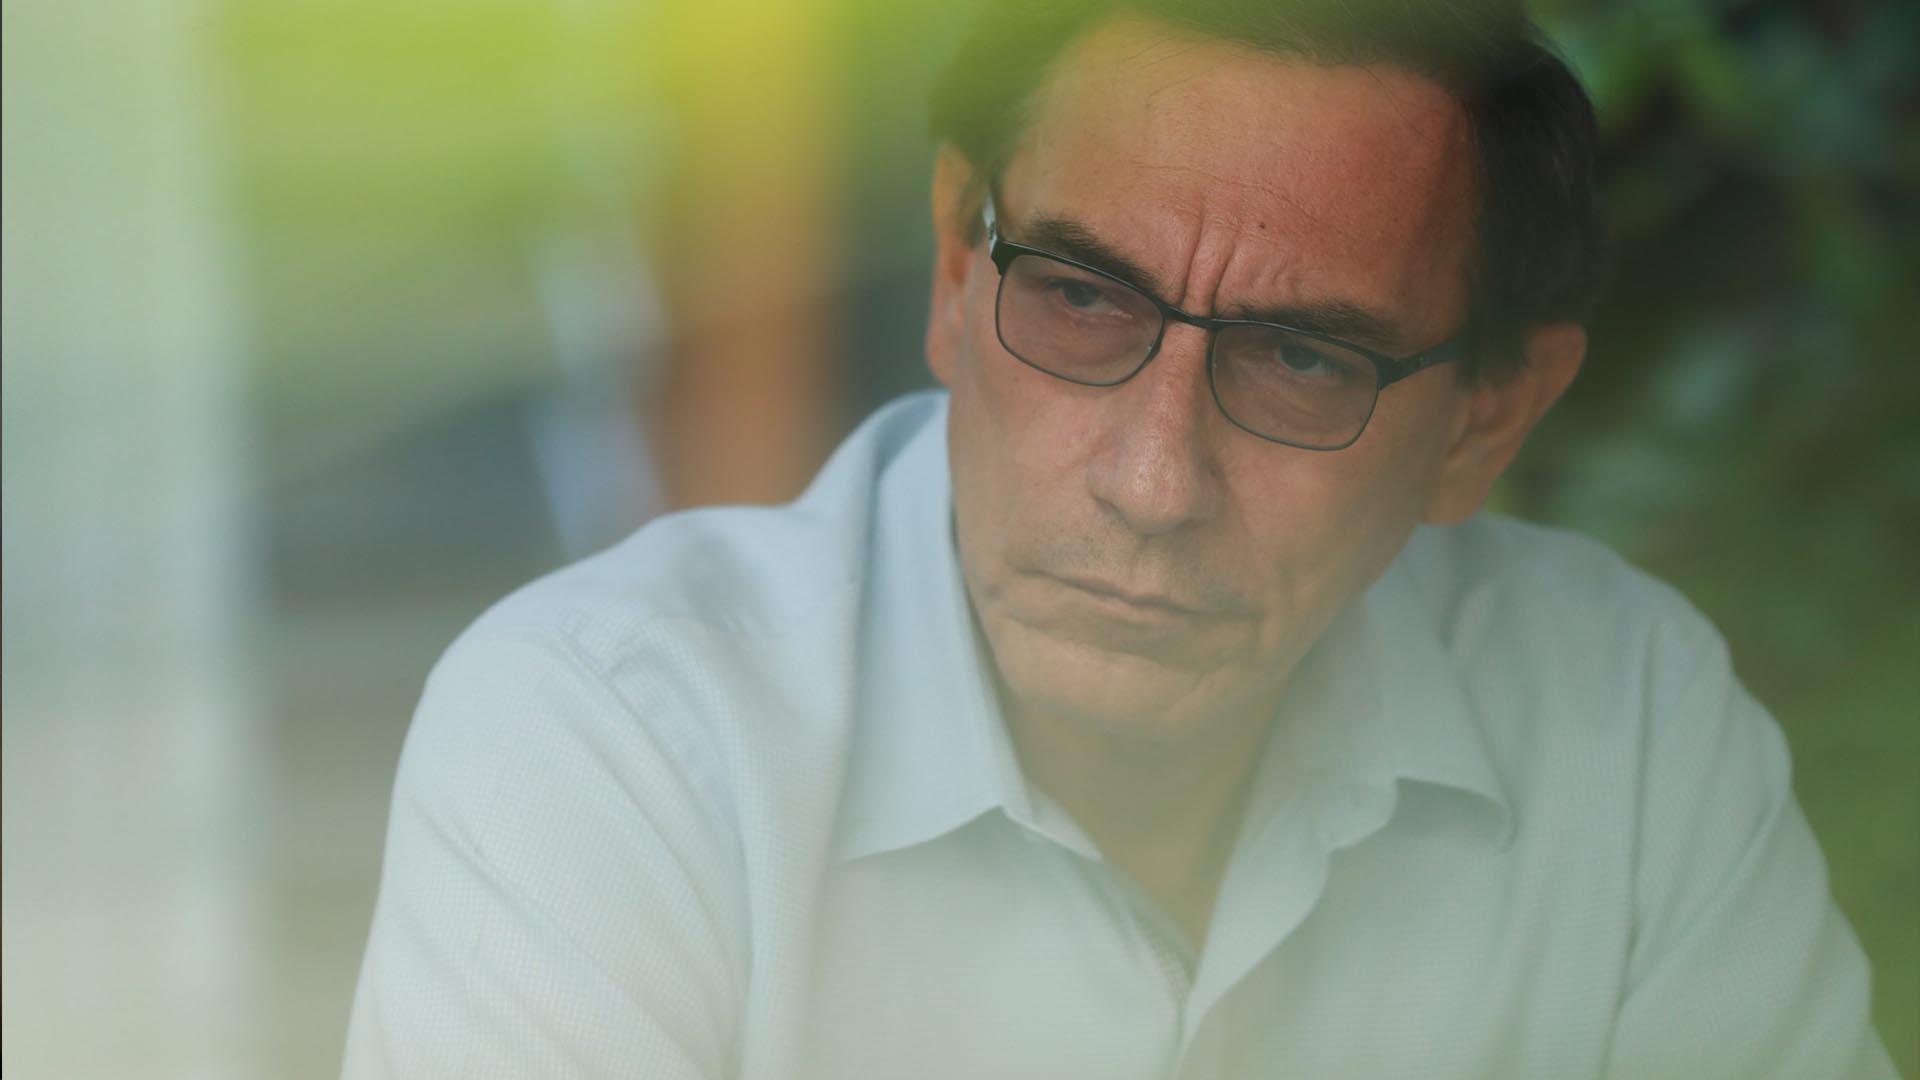 Martín Vízcarra